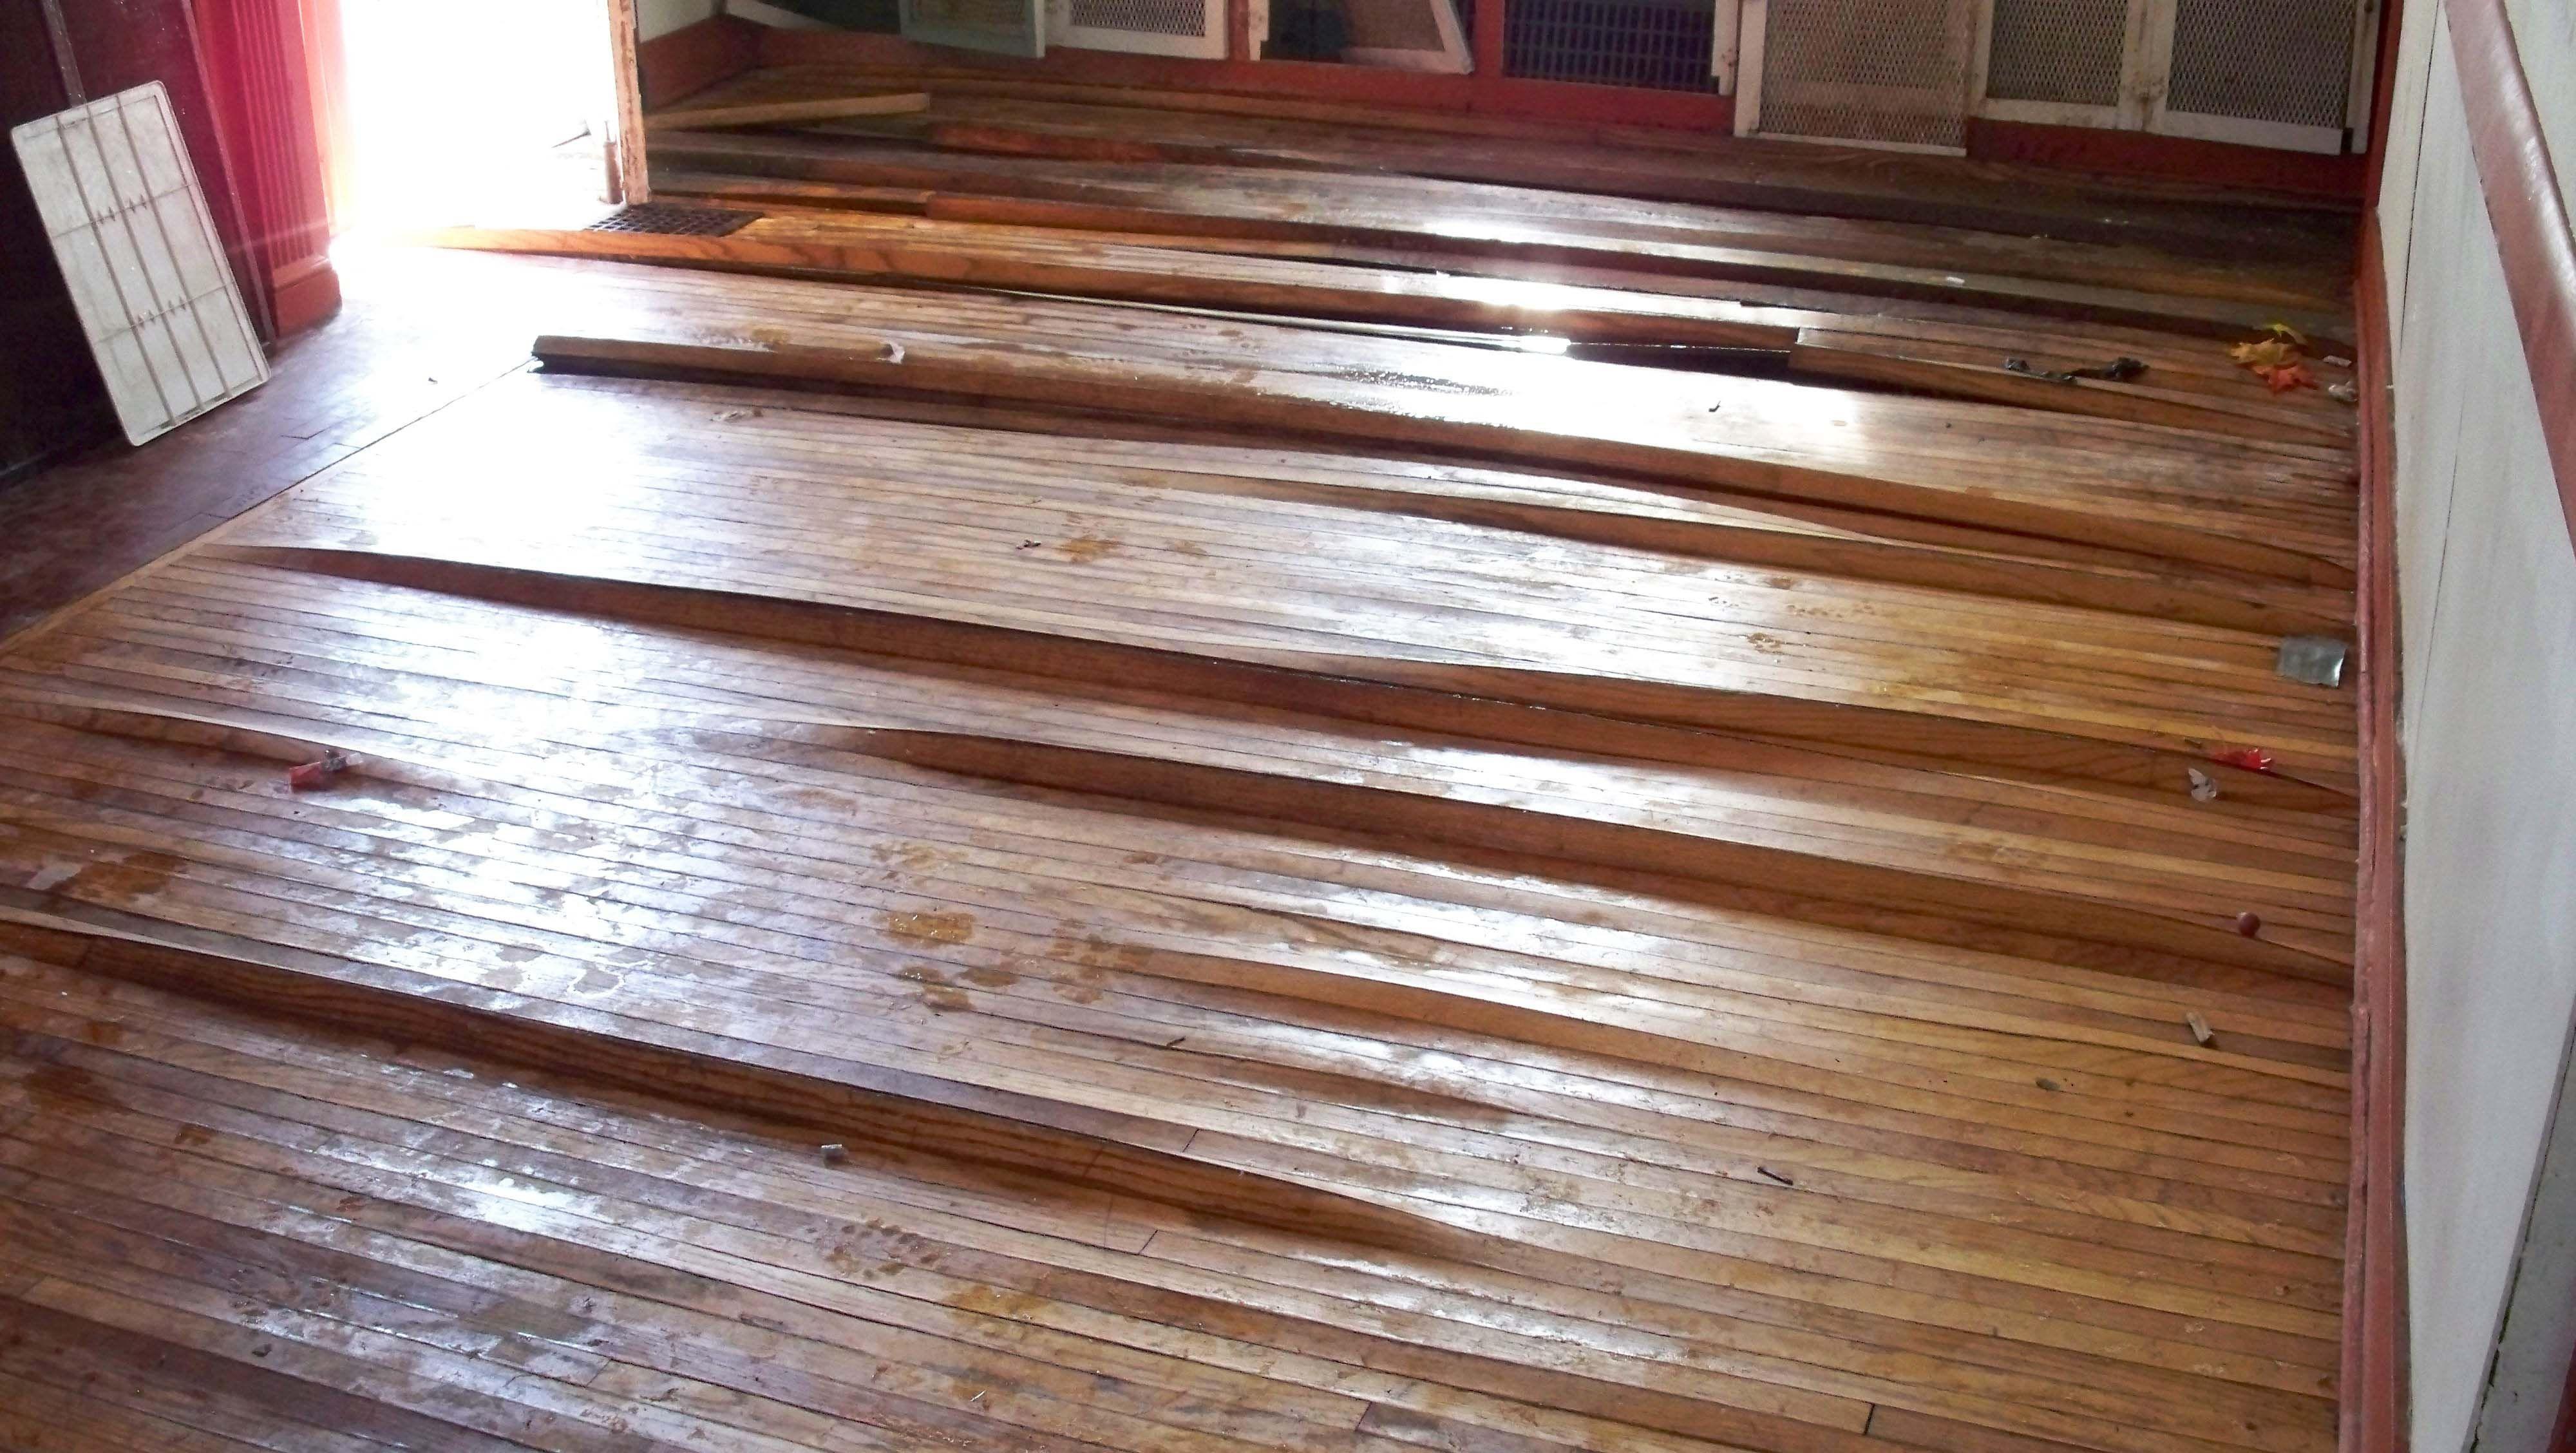 hardwood flooring reno of hardwood flooring deals where to buy hardwood flooring inspirational intended for hardwood flooring deals hardwood floor water damage warping hardwood floors